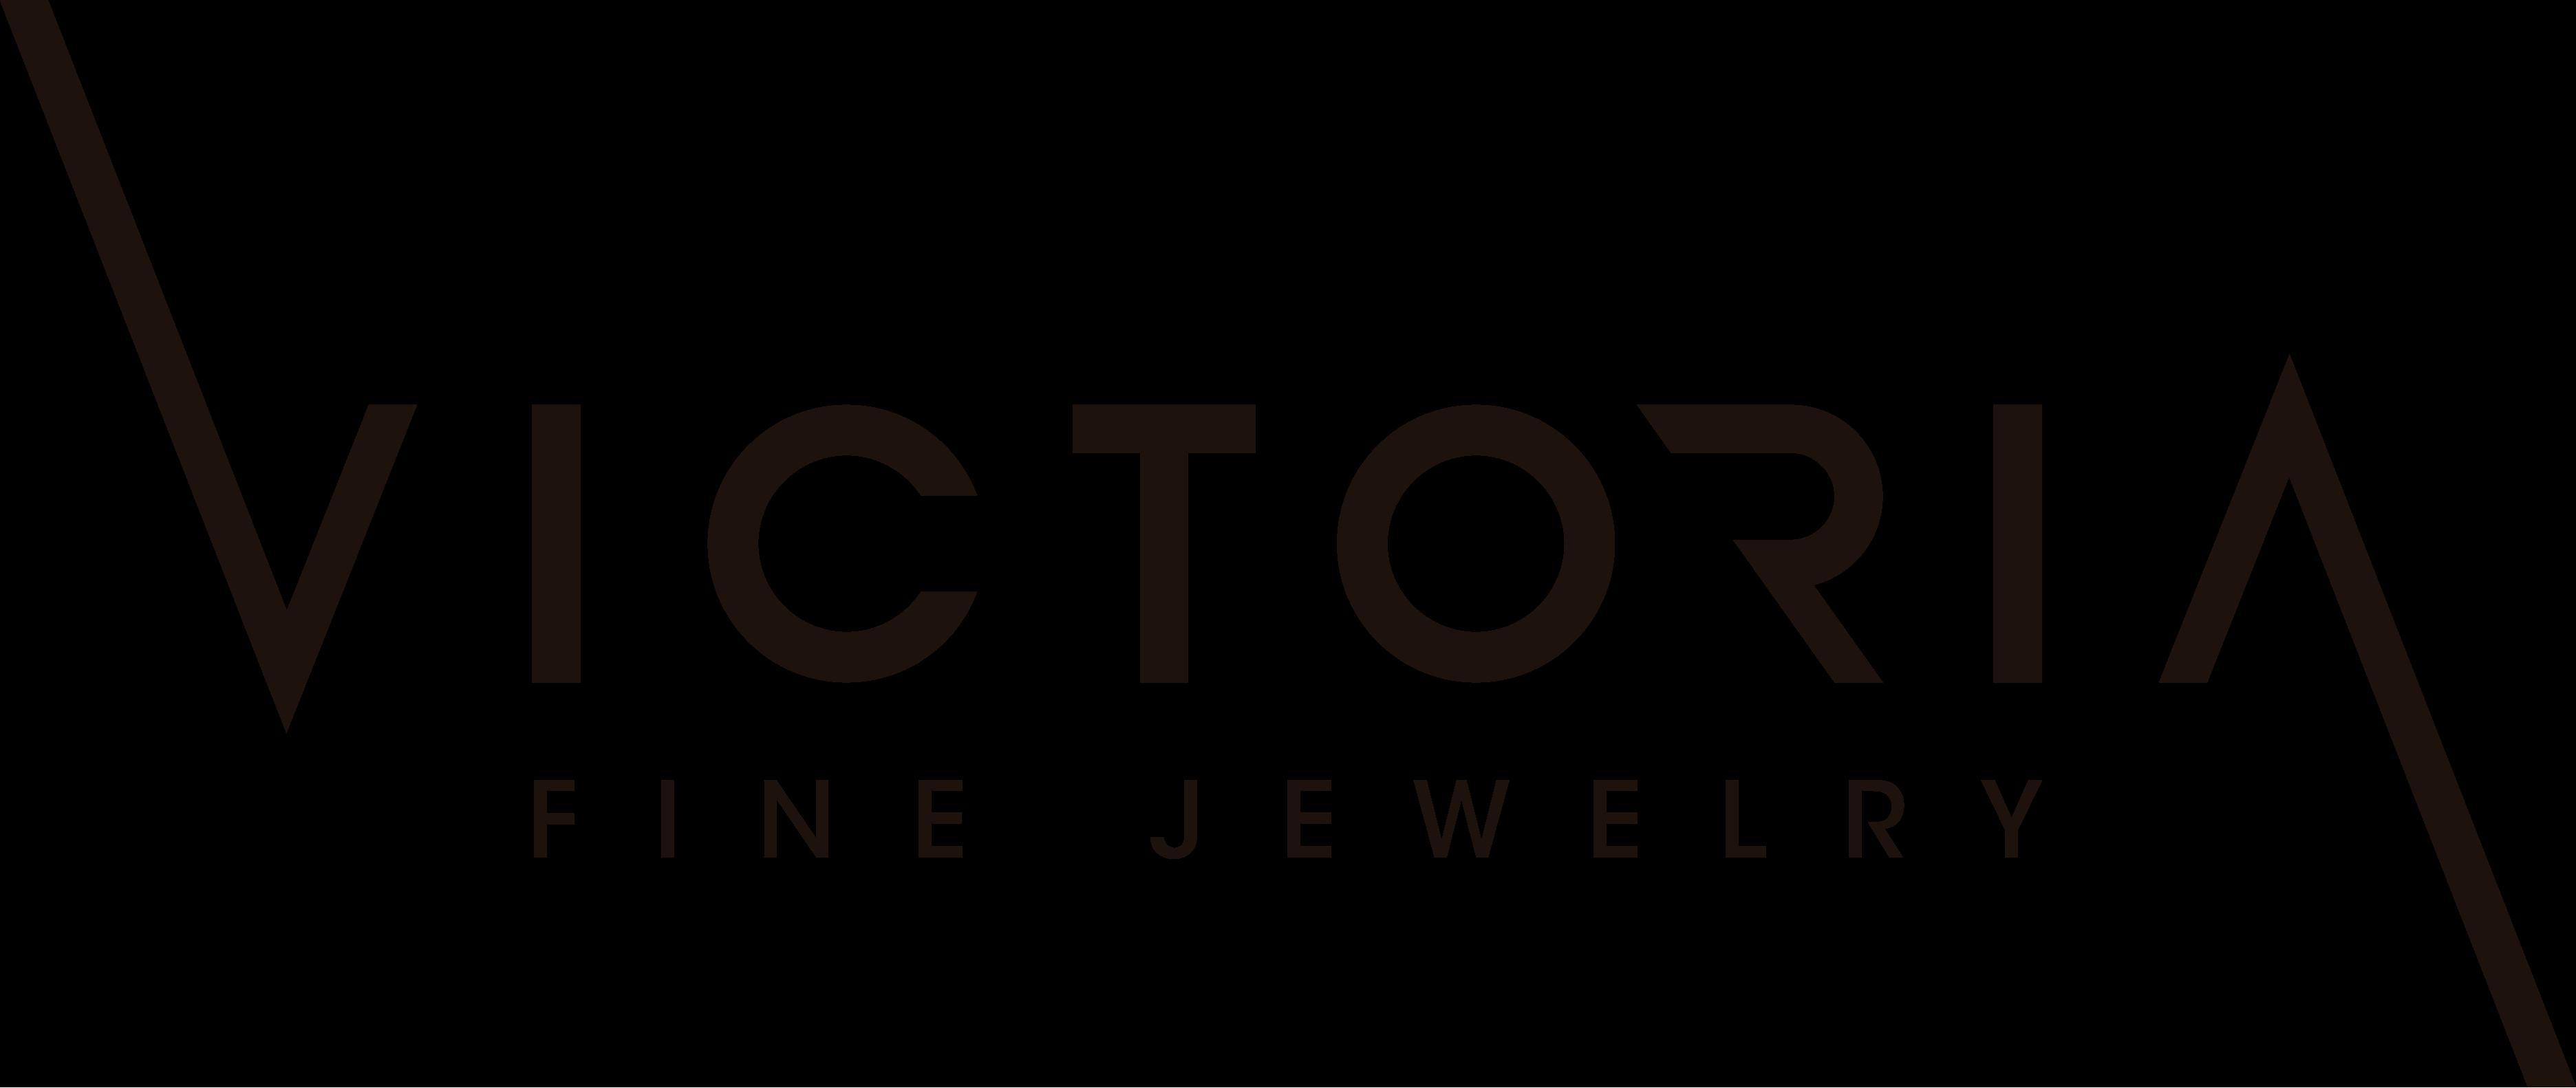 Victoria Fine Jewelry